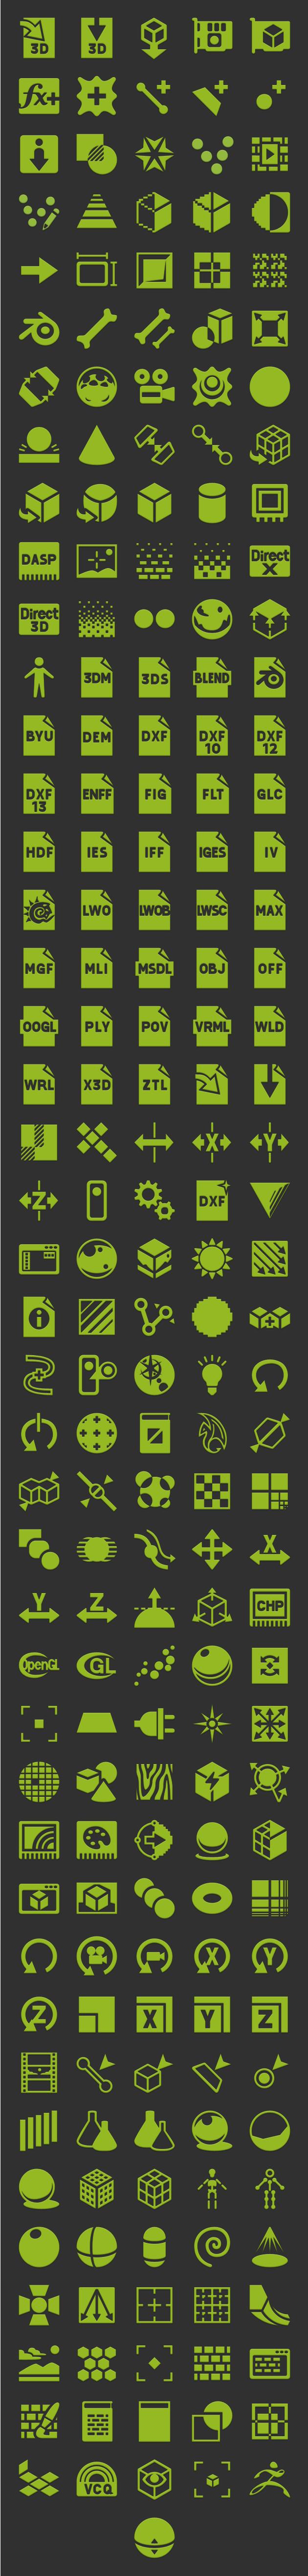 android 3d design laucher xhdpi